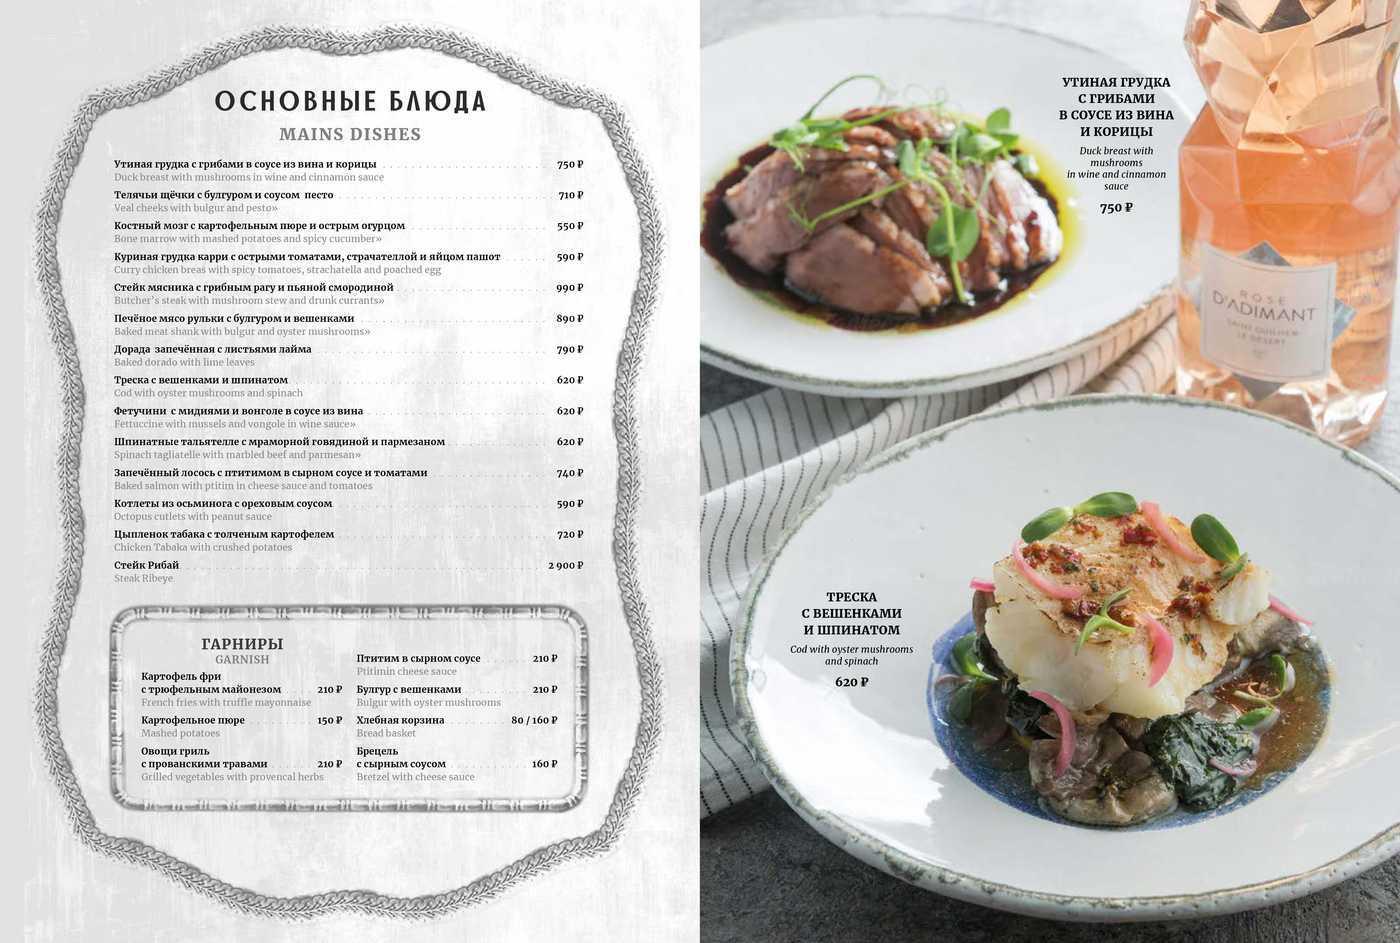 Меню ресторана Шато Винтаж (Chateau Vintage) на Невском проспекте фото 5